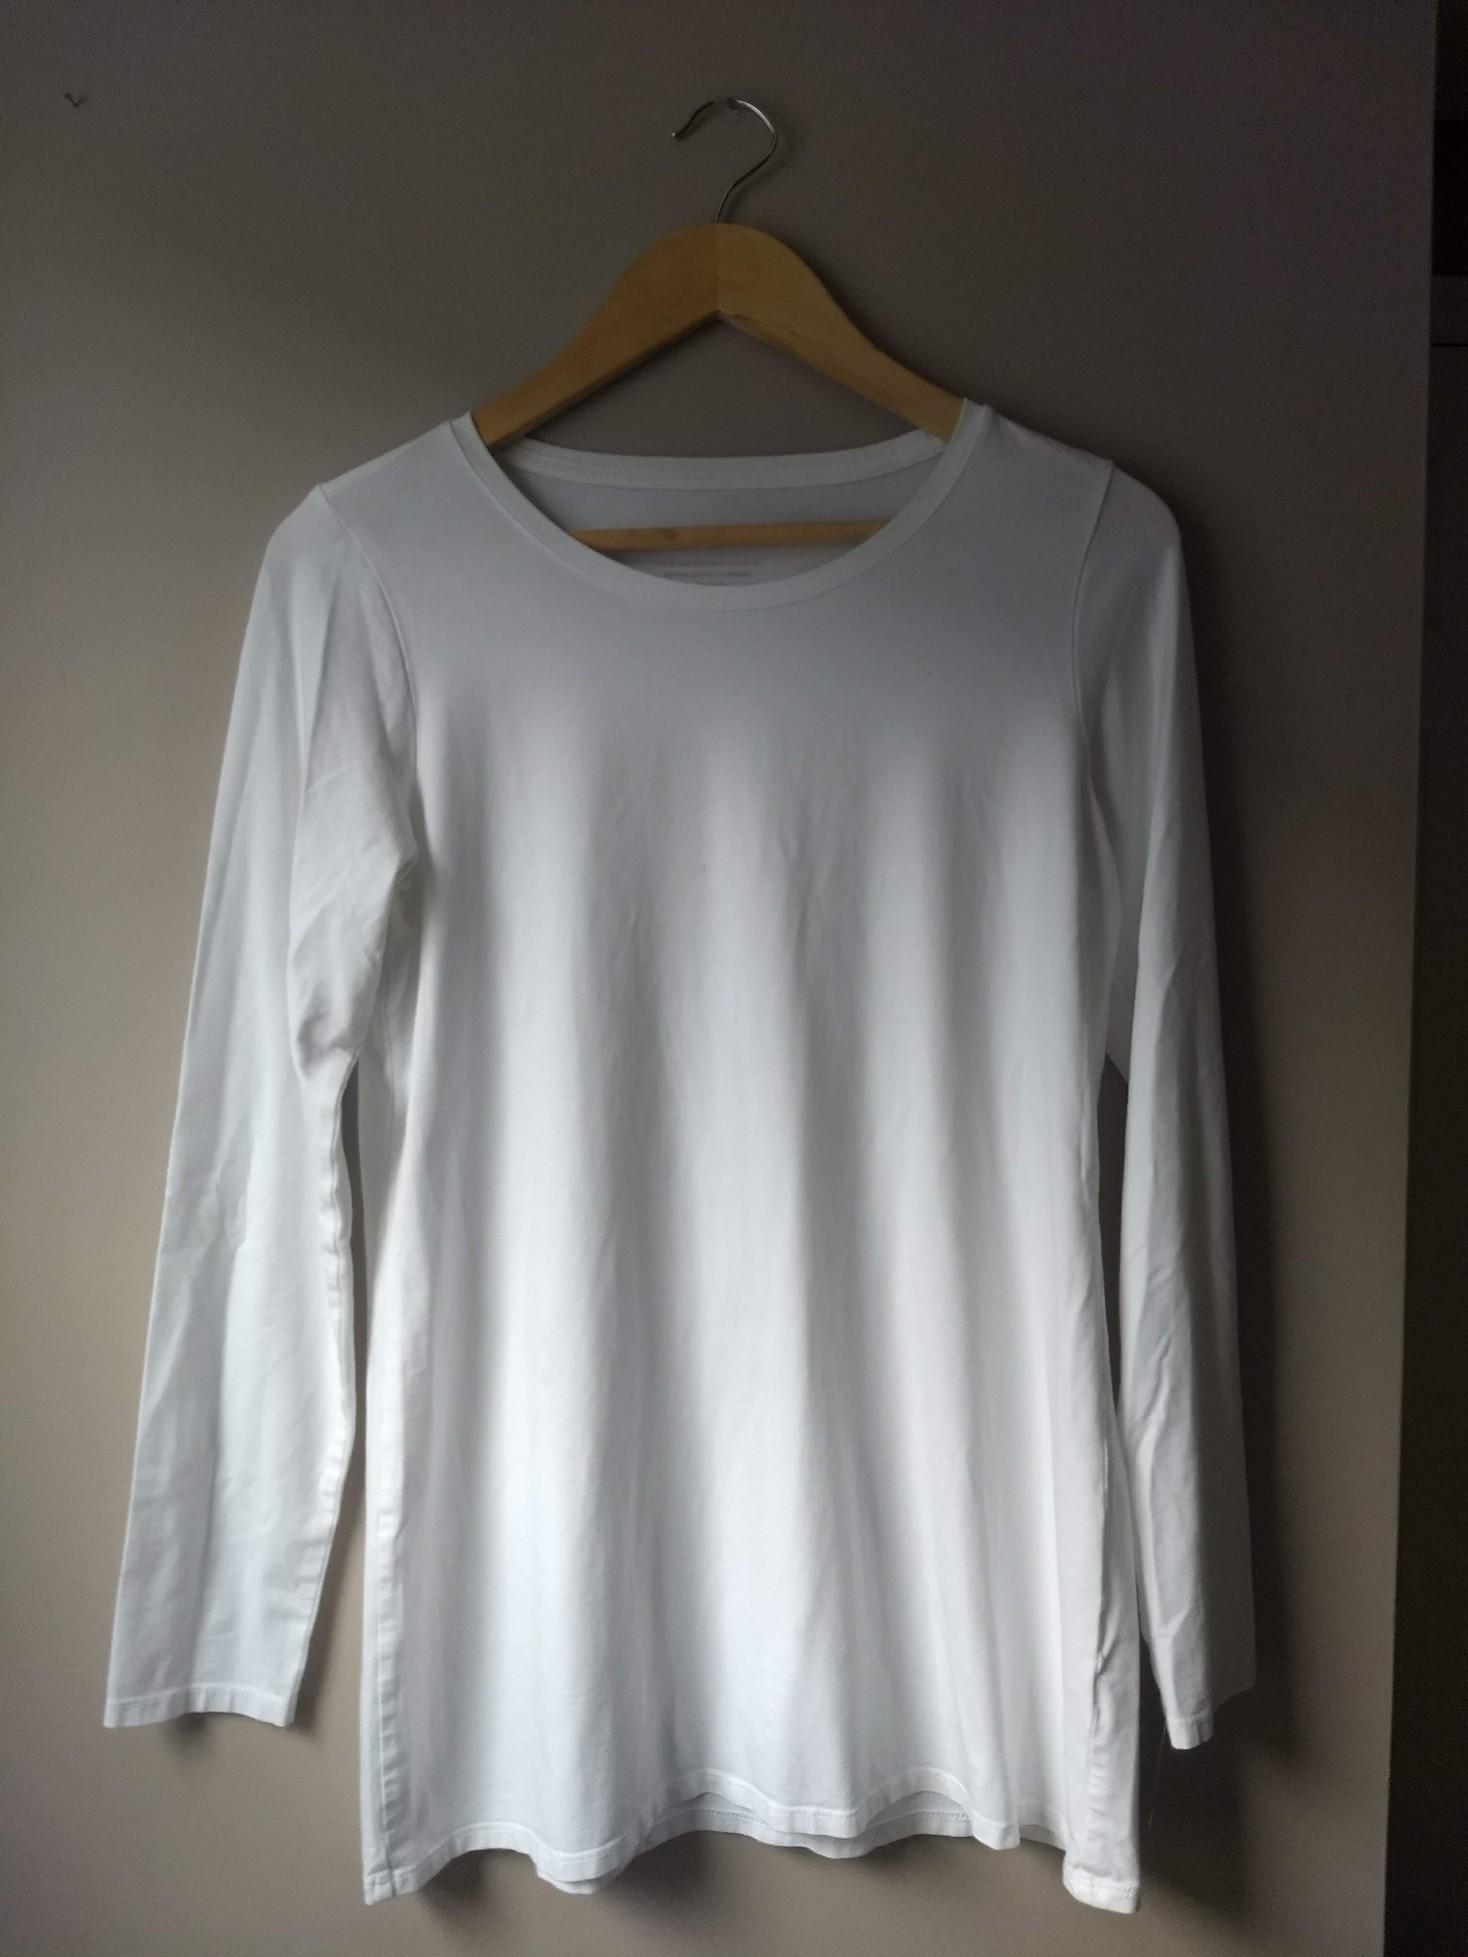 09b0eda97de5 Thriftshop Chic - Building a stylishly edited wardrobe from thrift ...